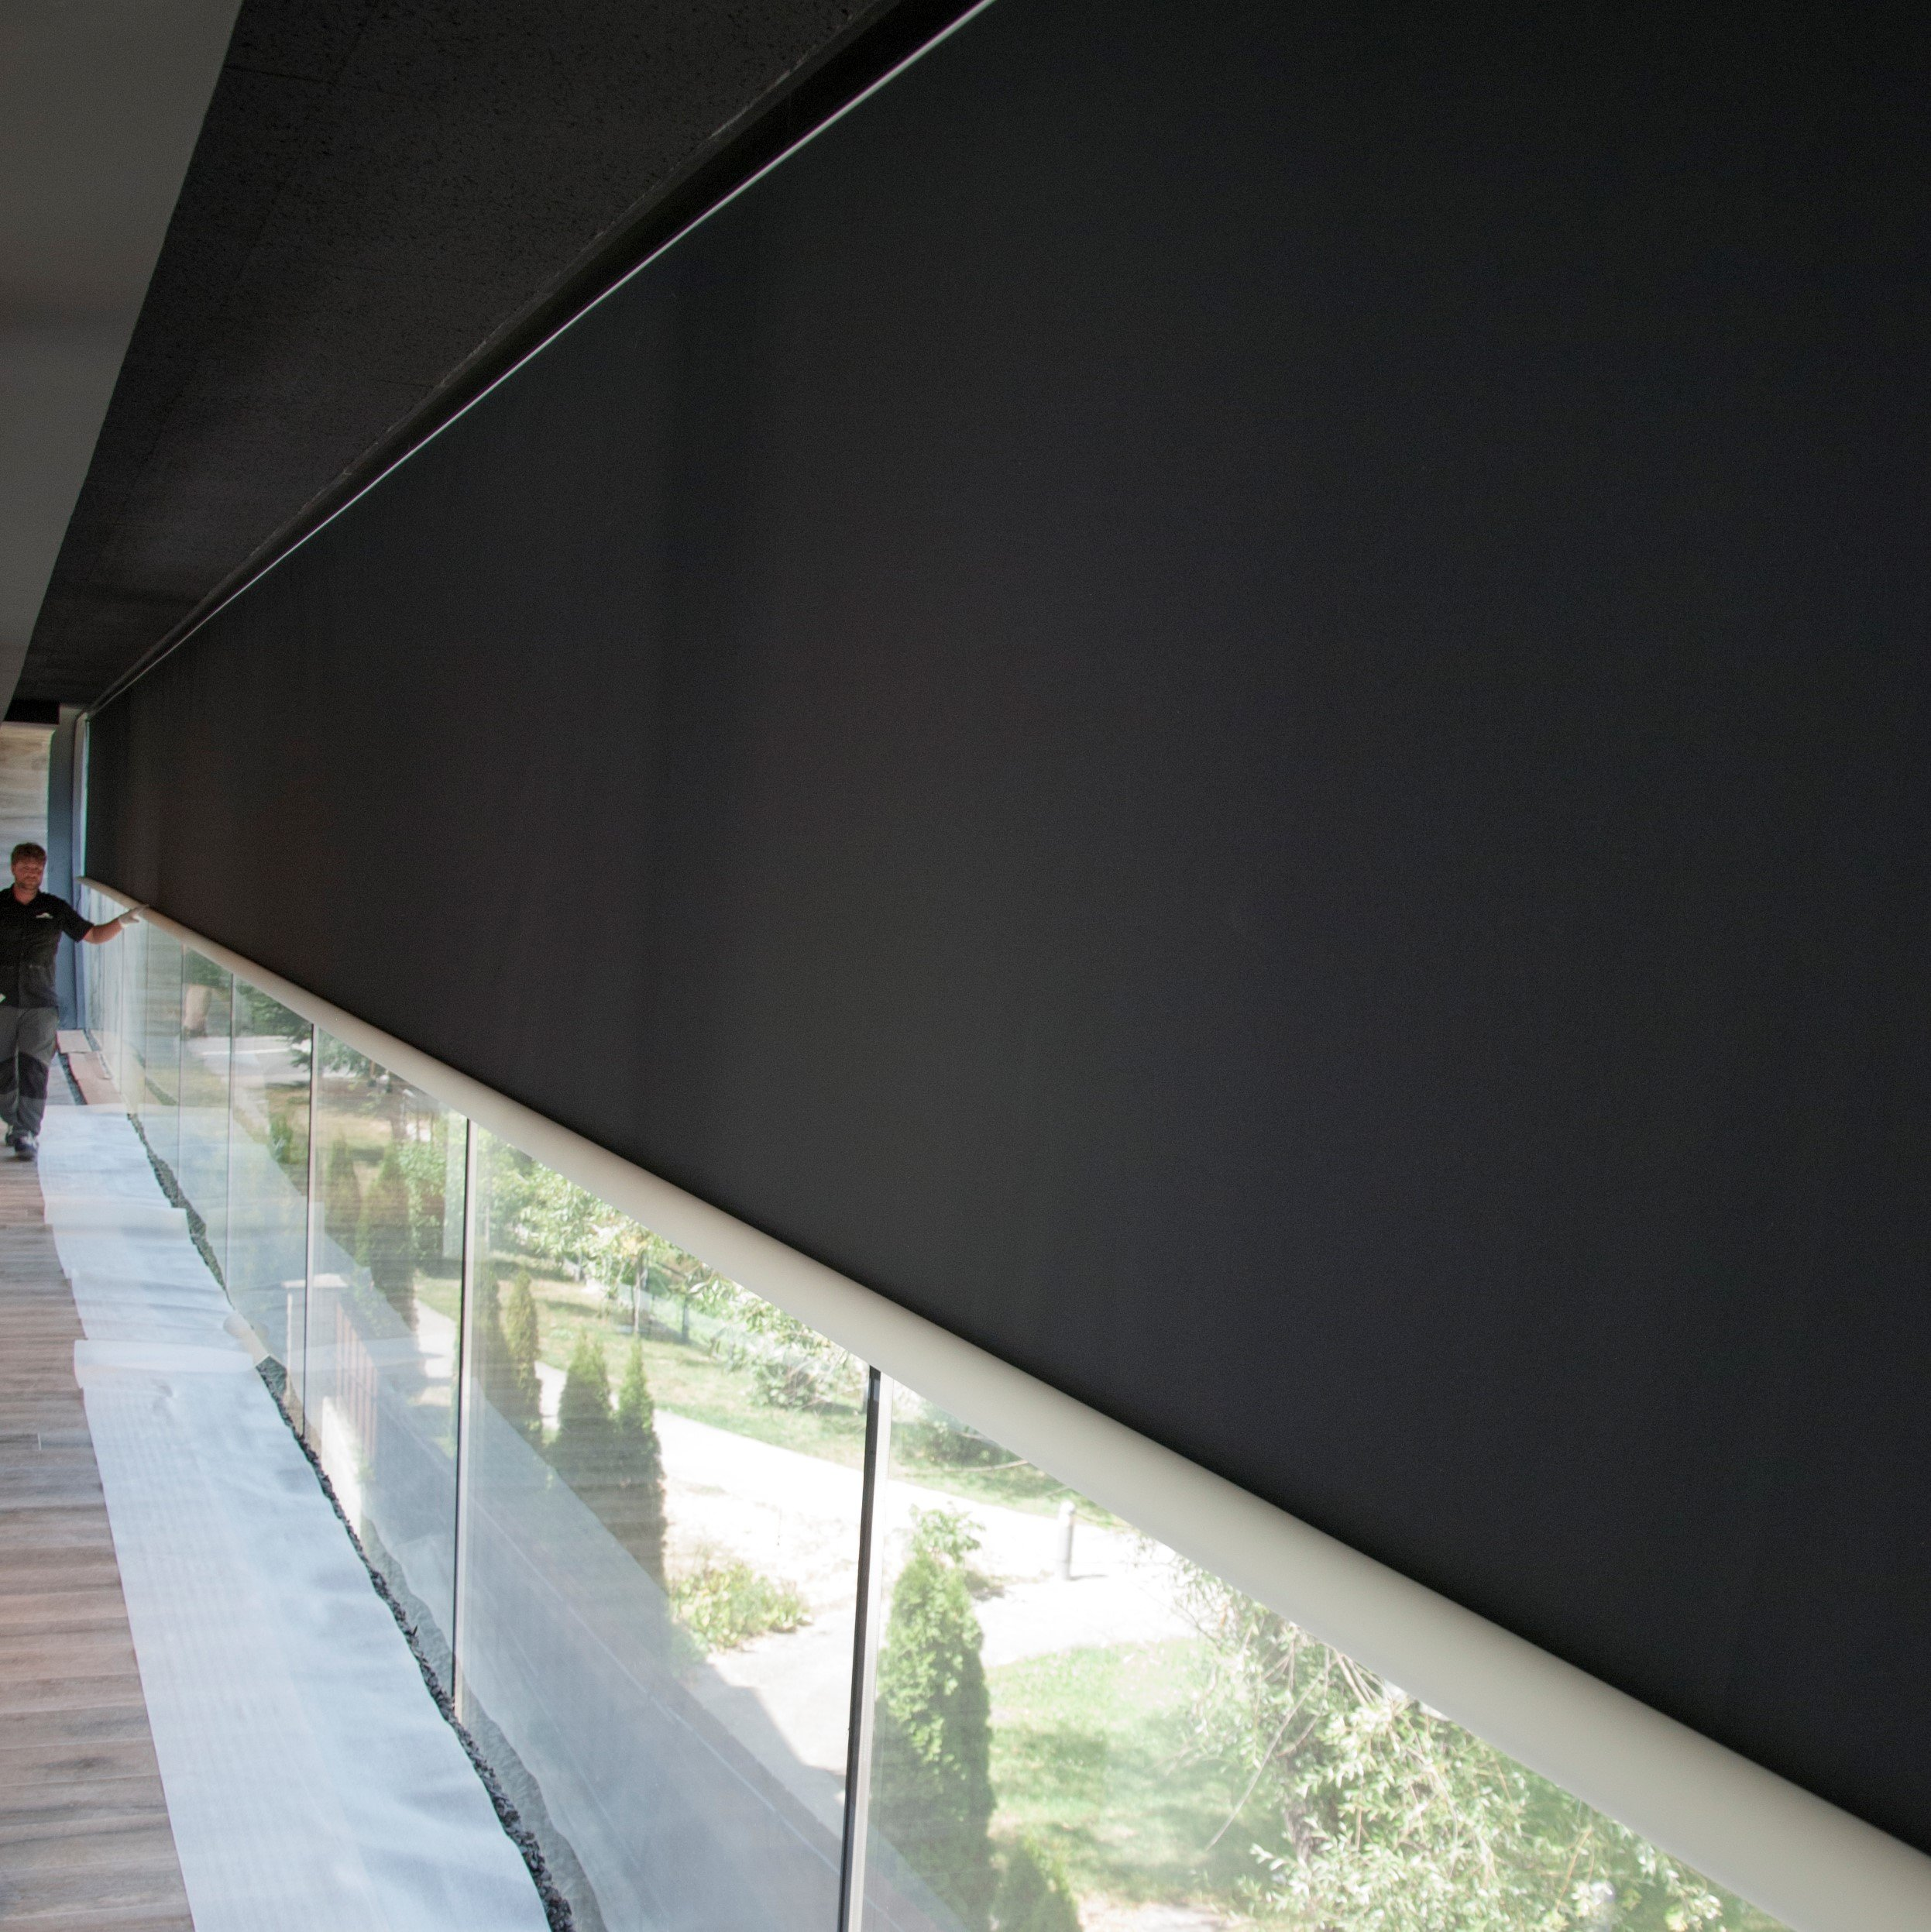 Coverglass